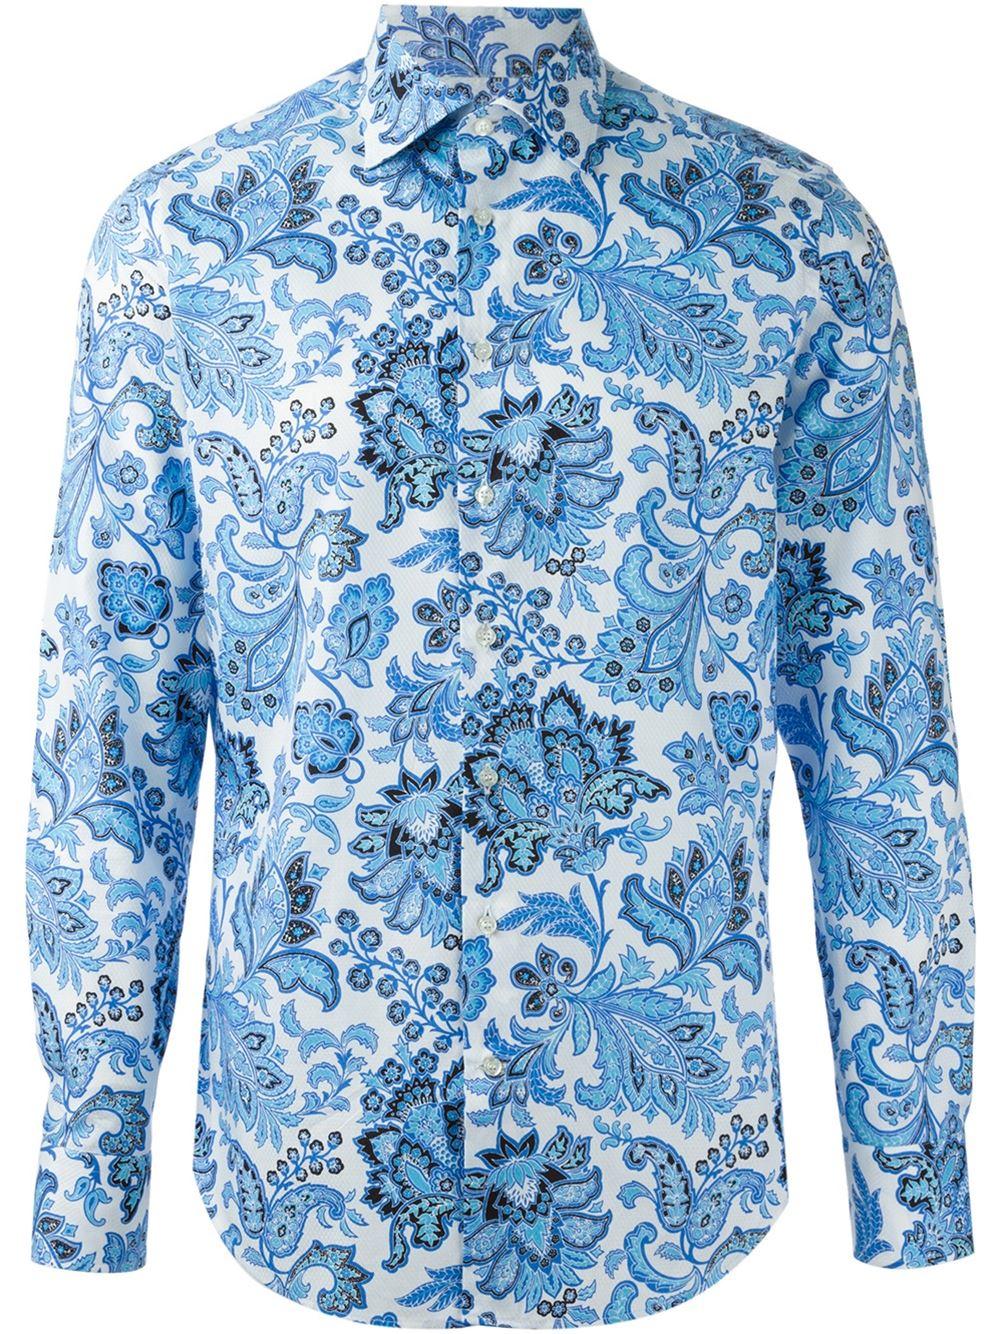 blue floral shirt mens is shirt